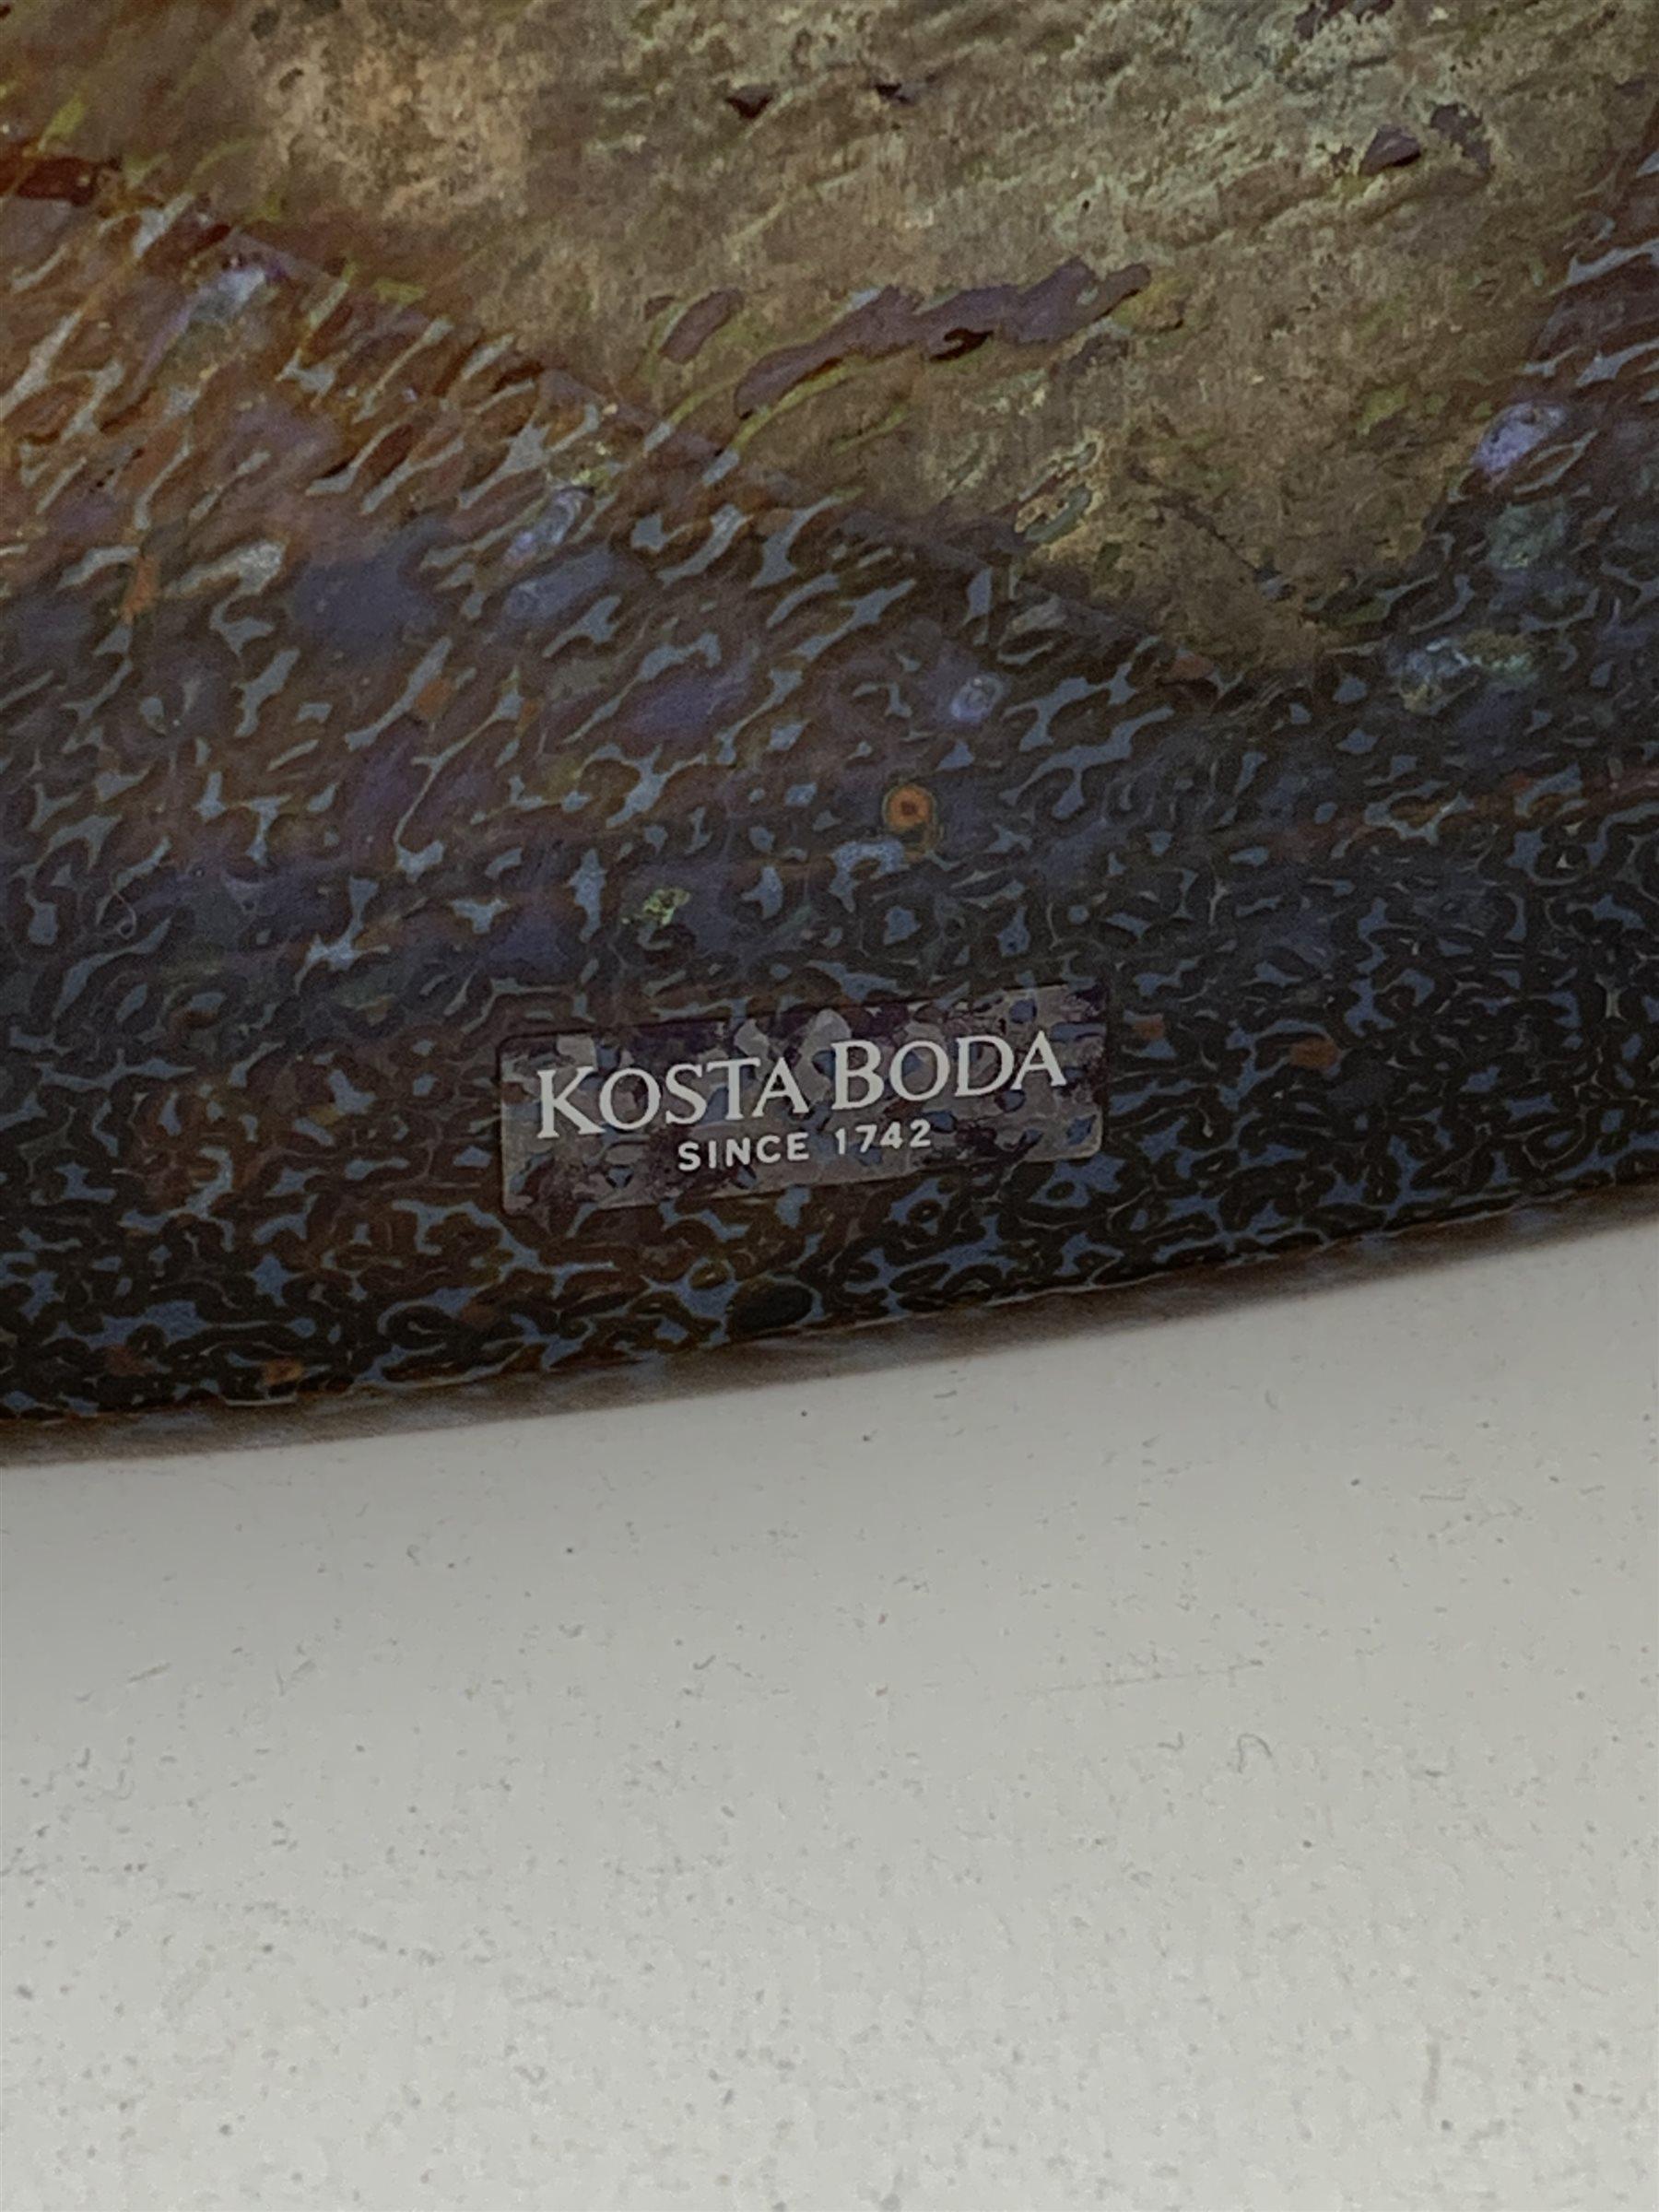 Bertil Vallien - Kosta Boda, satellite glass vase of compressed square form with bottle neck, with - Image 2 of 7